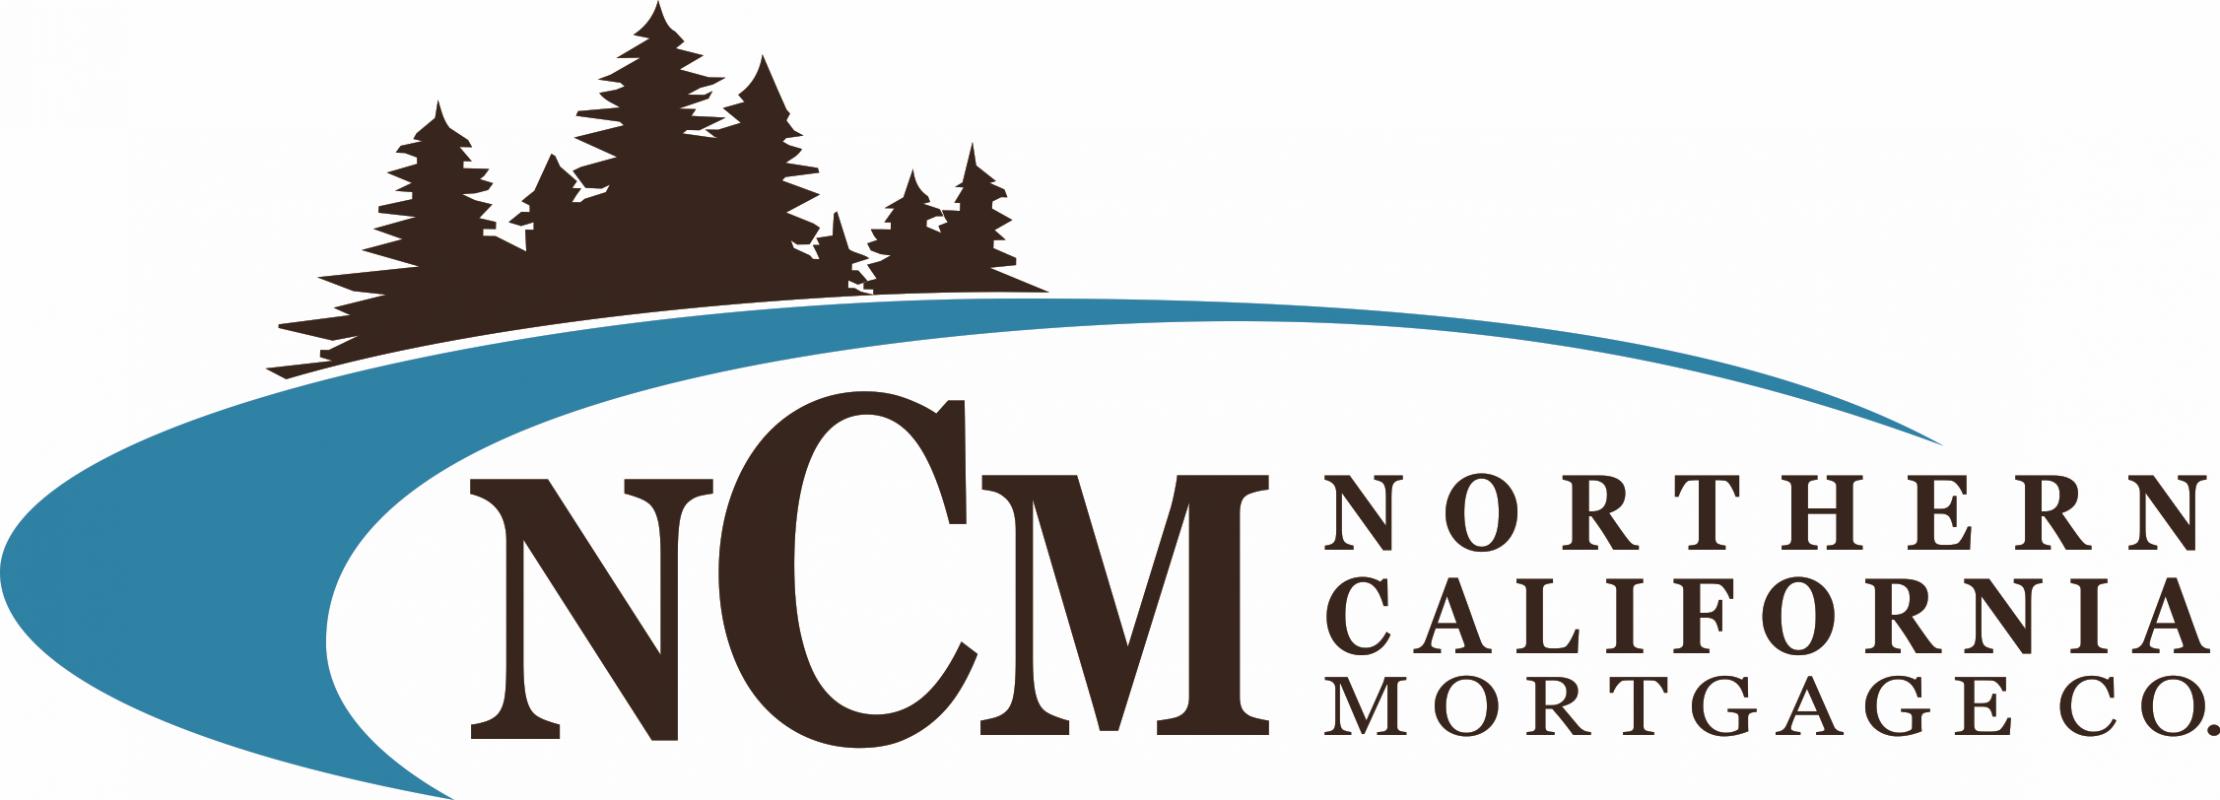 Northern California Mortgage